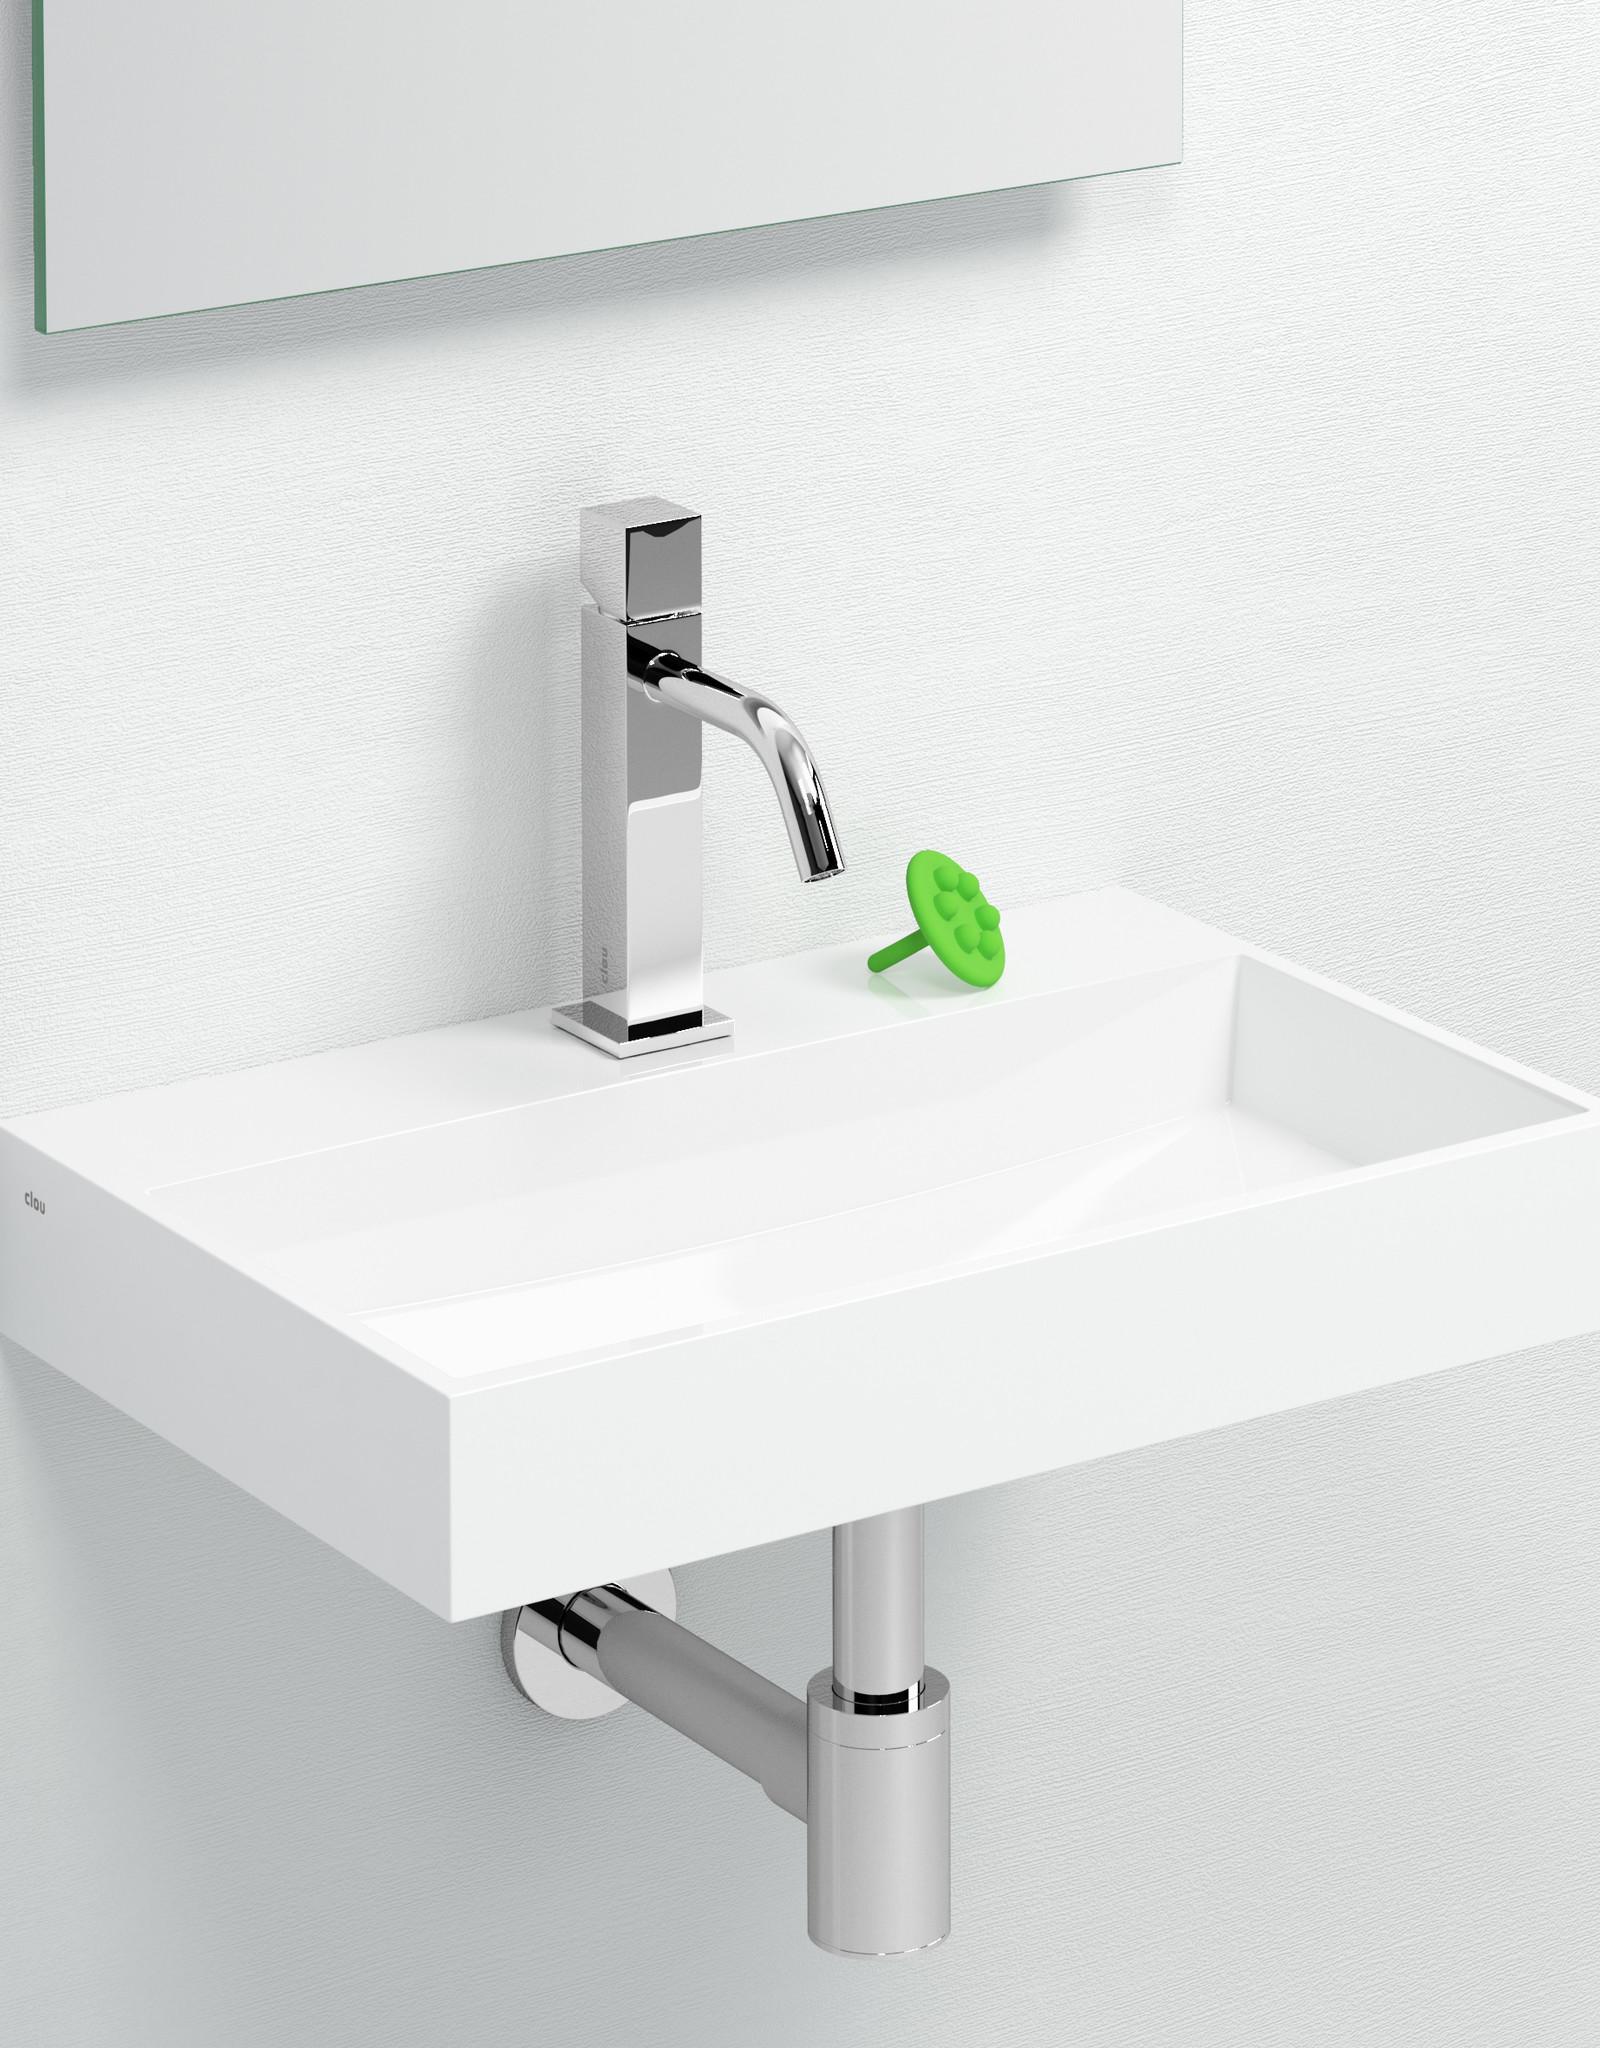 Xo Xo washbasin mixer type 12 - outlet